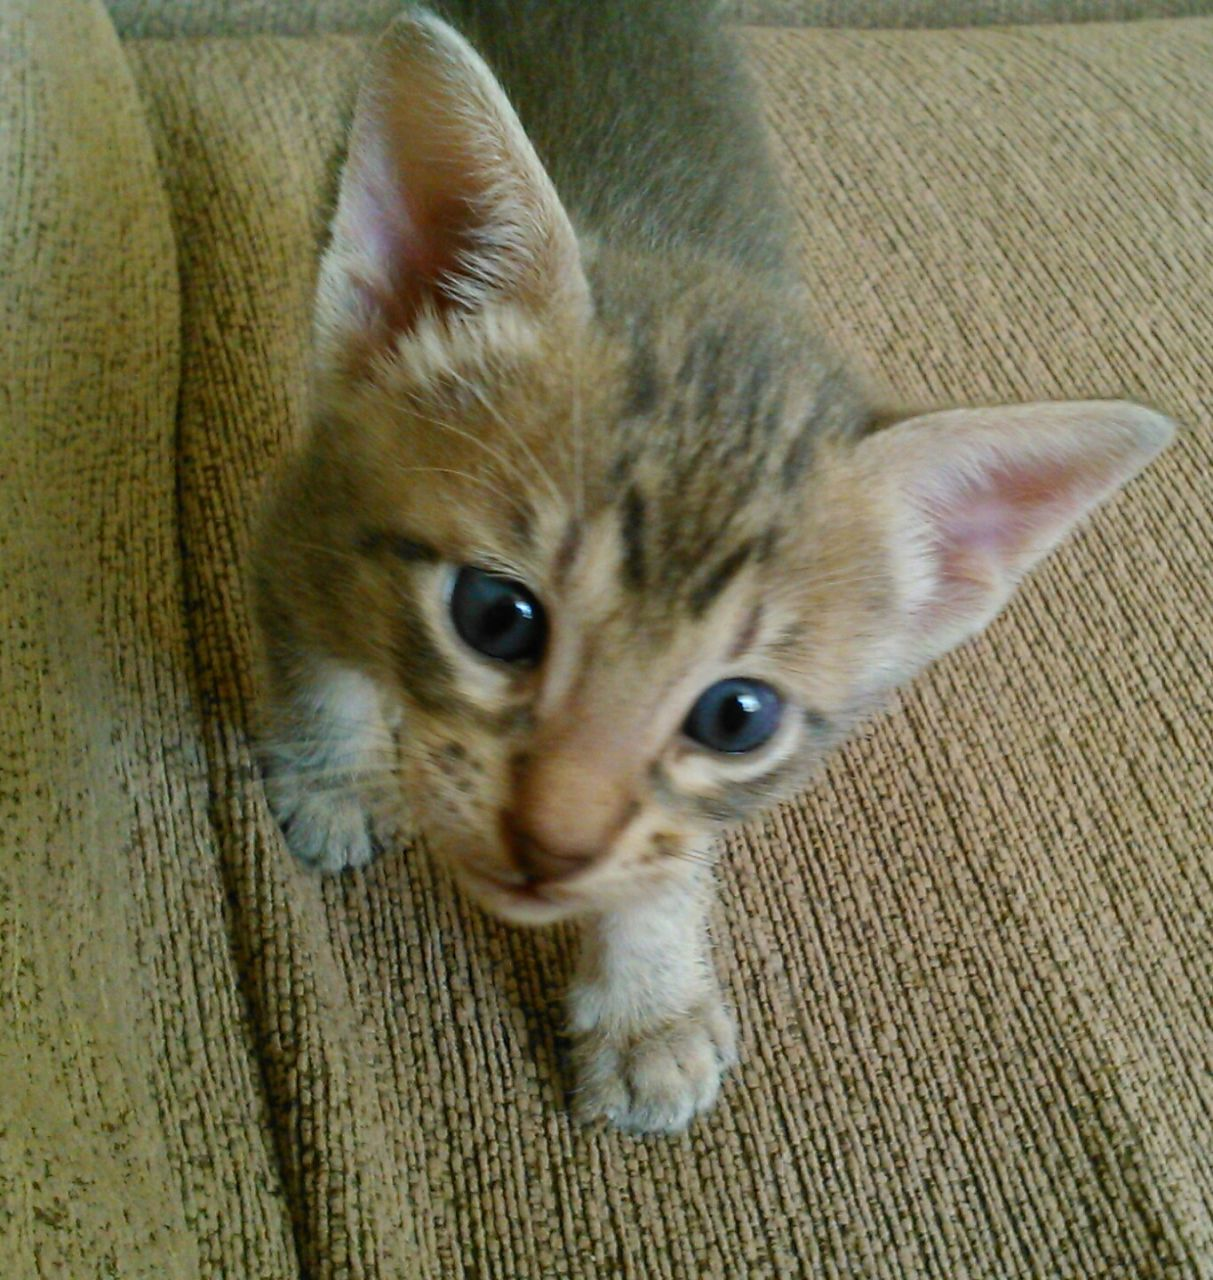 Serengeti Kitten: Serengeti First Generation Serengeti Kittens For Sale Blyth Breed